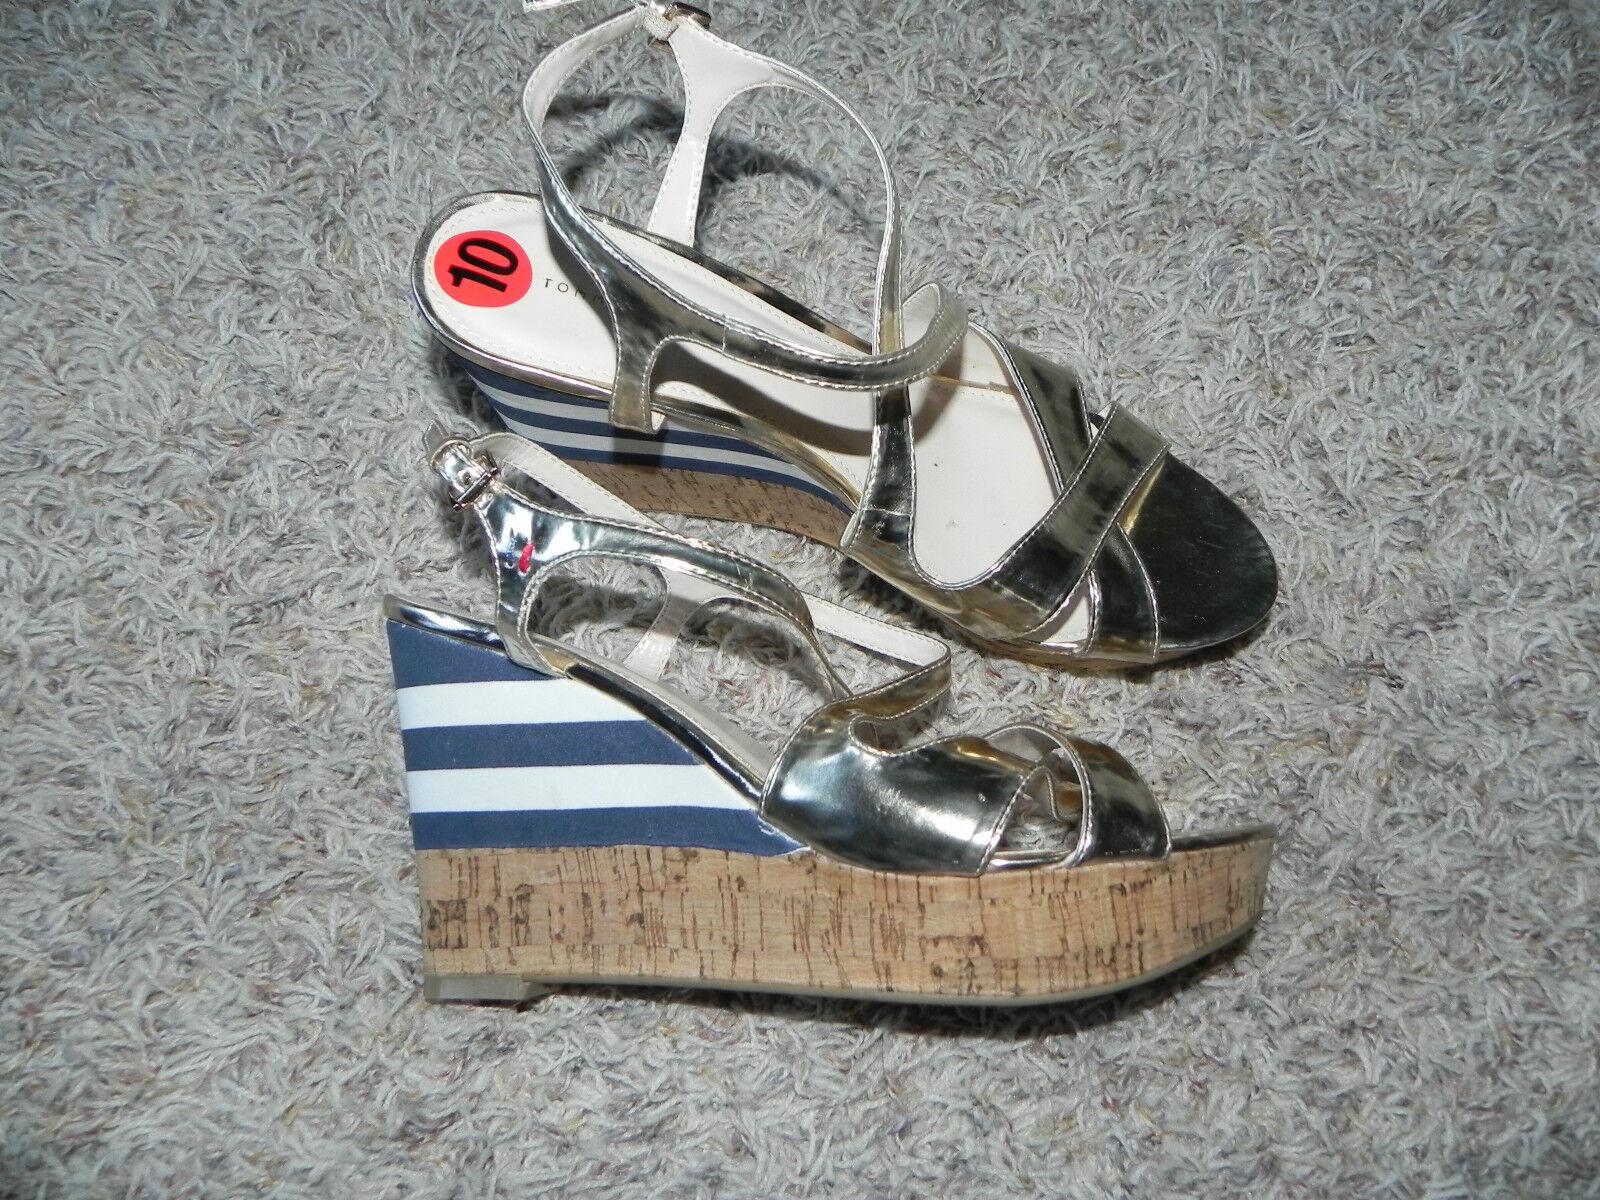 EARTHIES Laguna Red Peep Toe Mule Sandals Women's US Shoe Size 7M